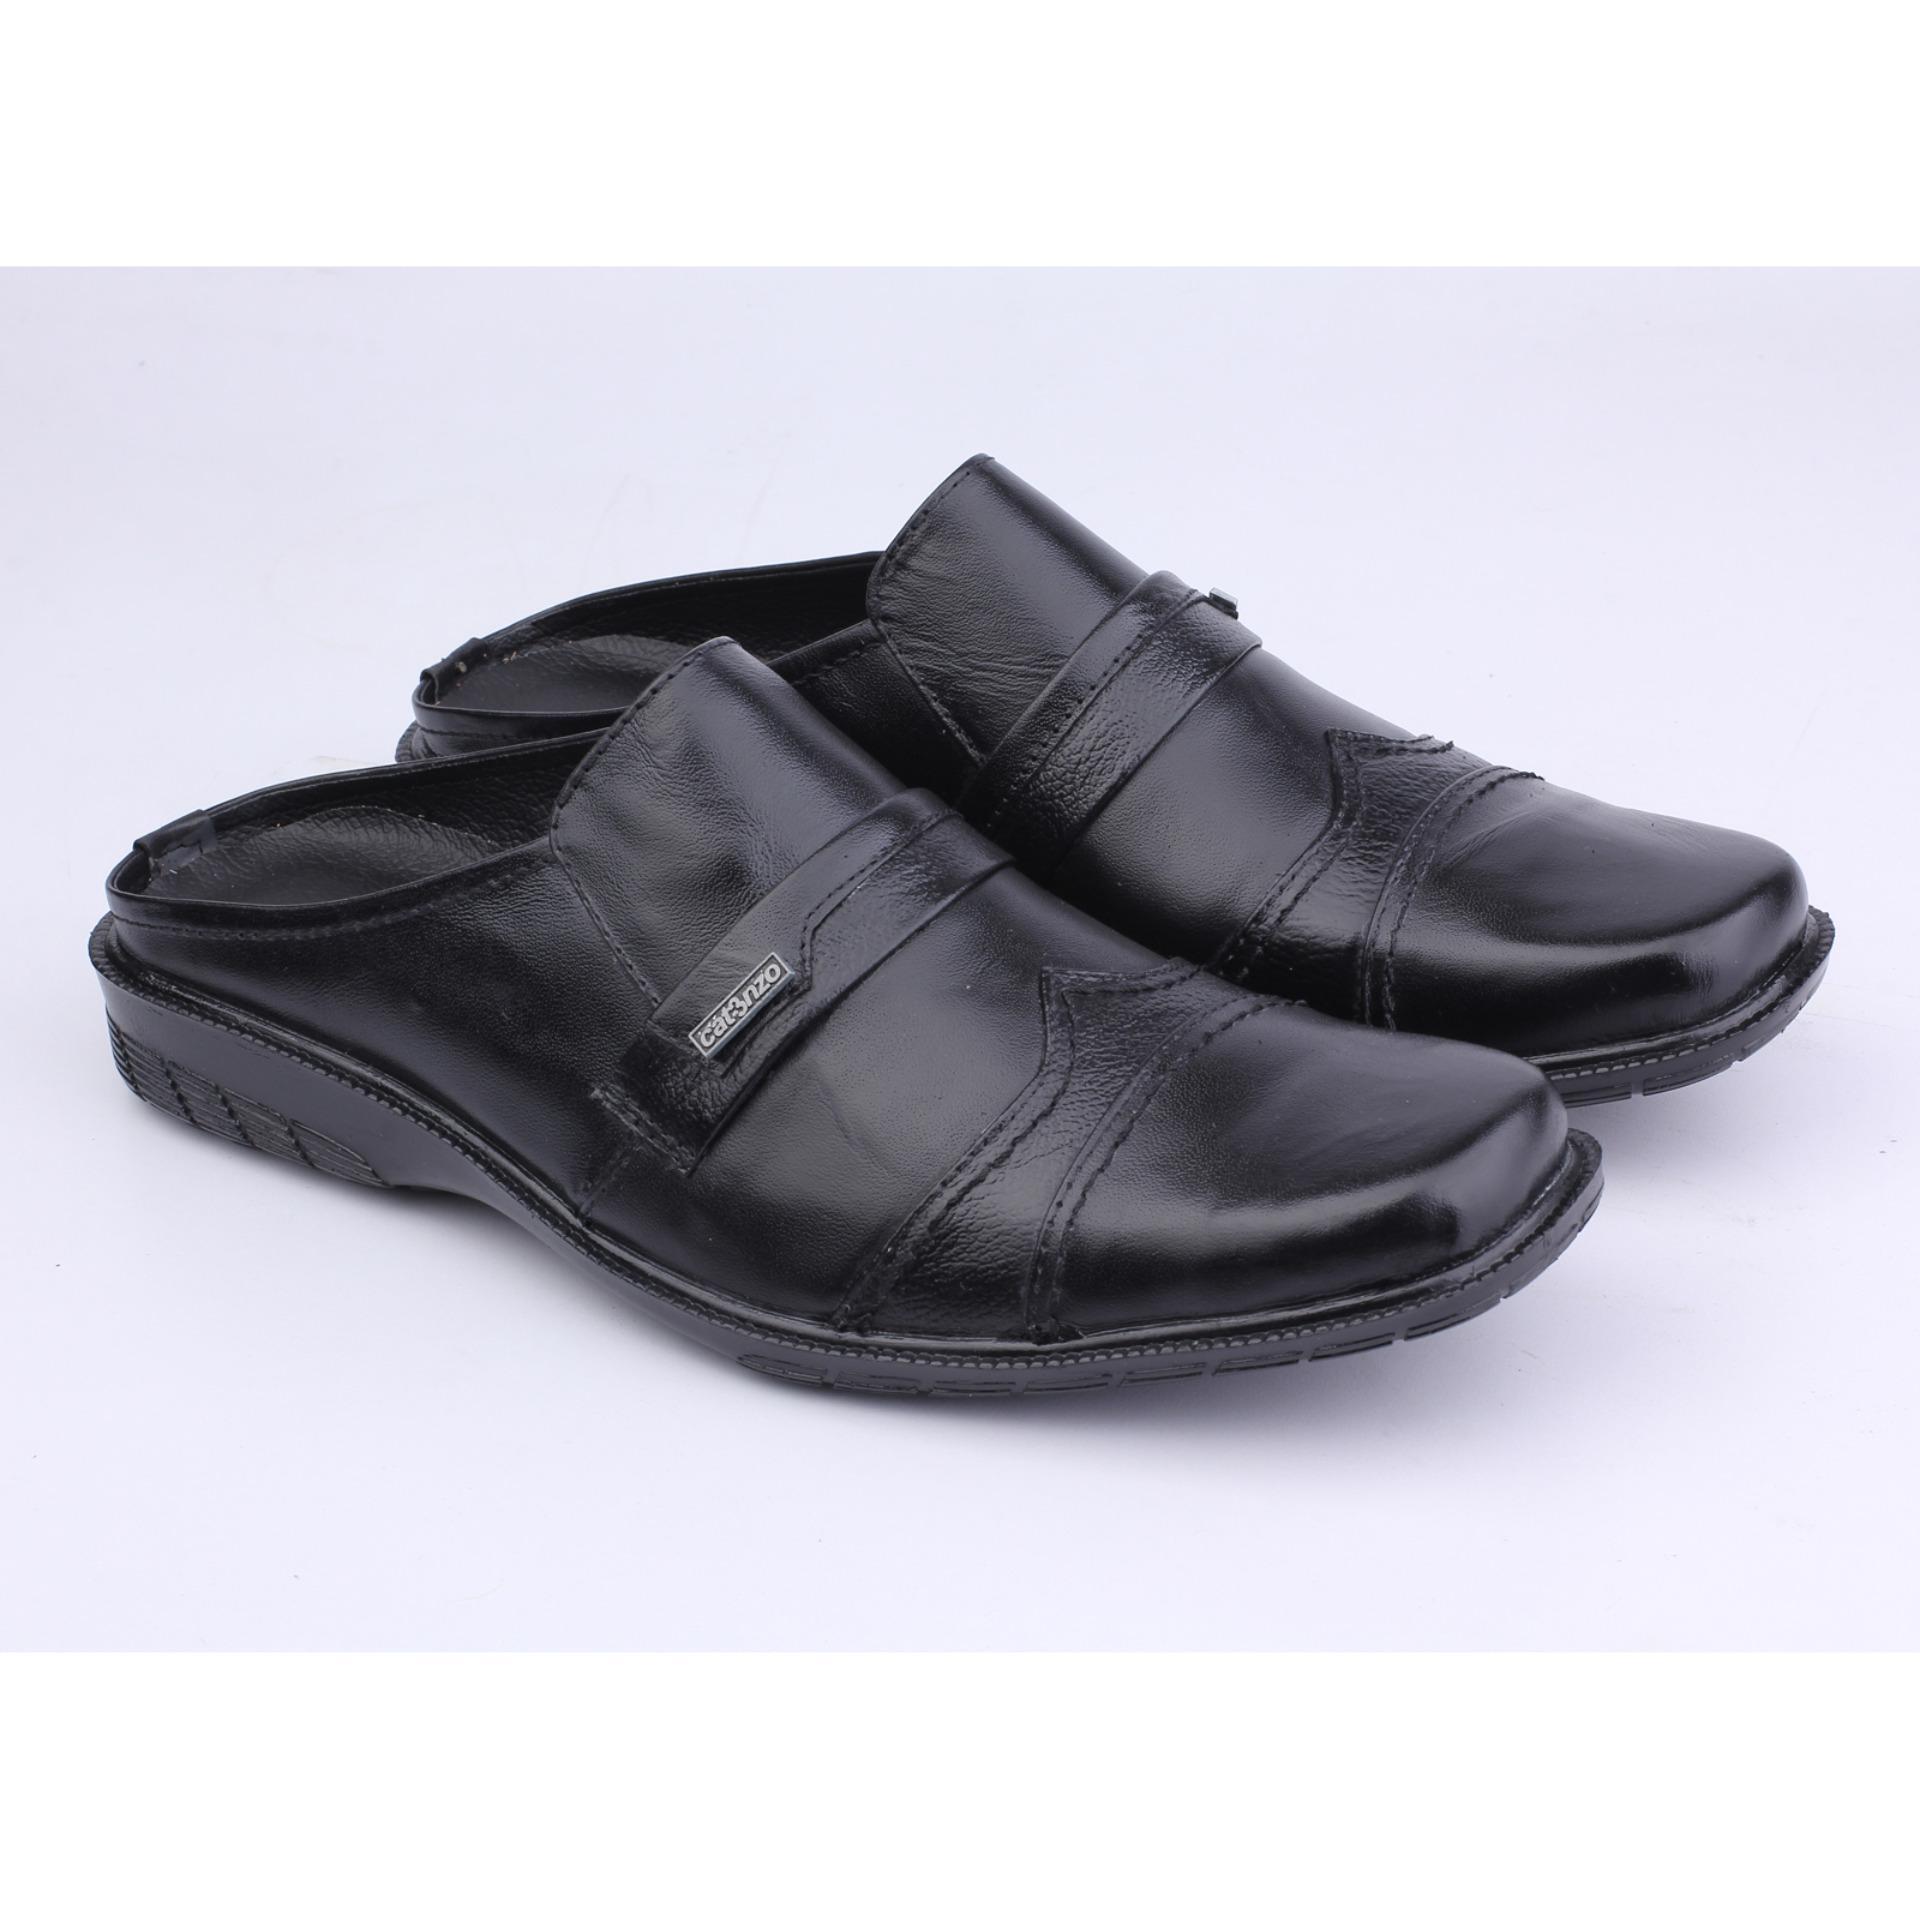 Harga Catenzo Sandal Pantofel Kulit Pria Sepatu Sandal Ya 042 Hitam Jawa Barat